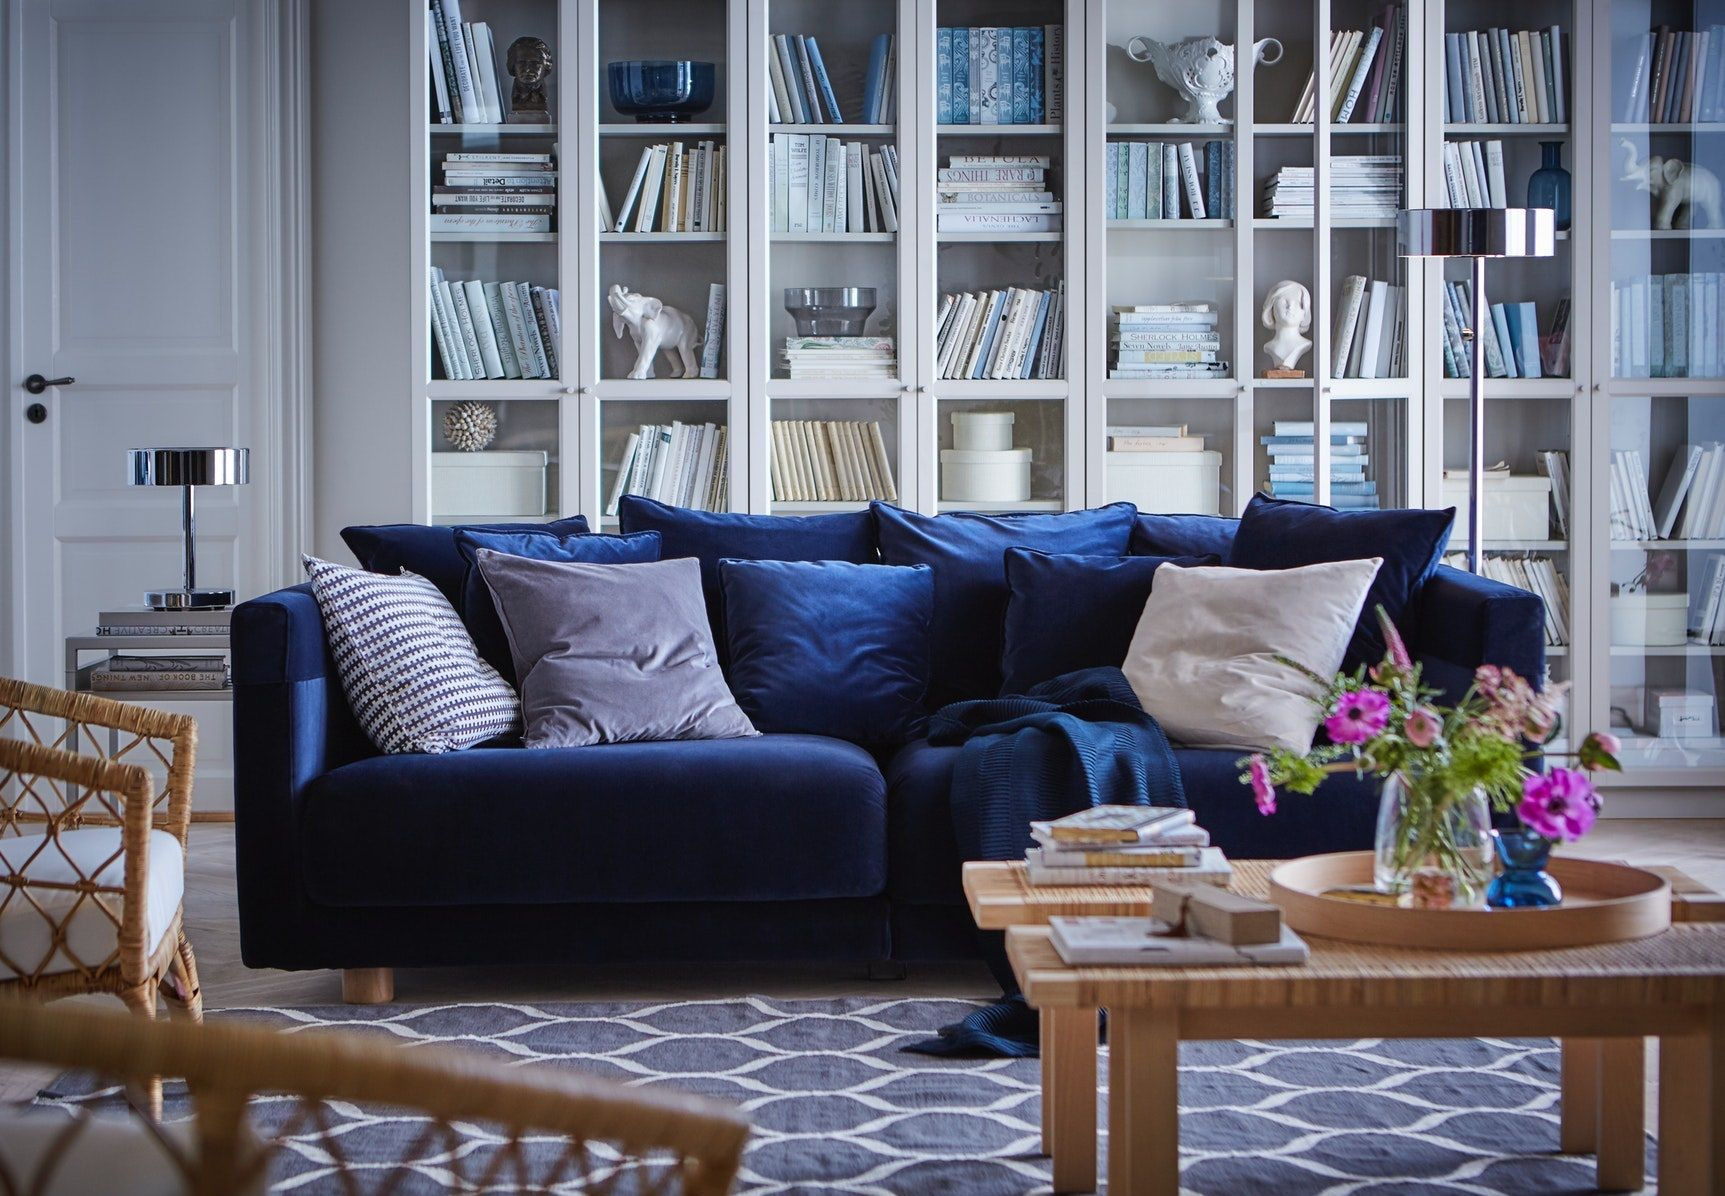 Stockholm 2017 Rug Flatwoven Handmade Net Pattern Grey Ikea Hong Kong And Macau Home Decor Cheap Home Decor Cozy Furniture [ 1196 x 1725 Pixel ]